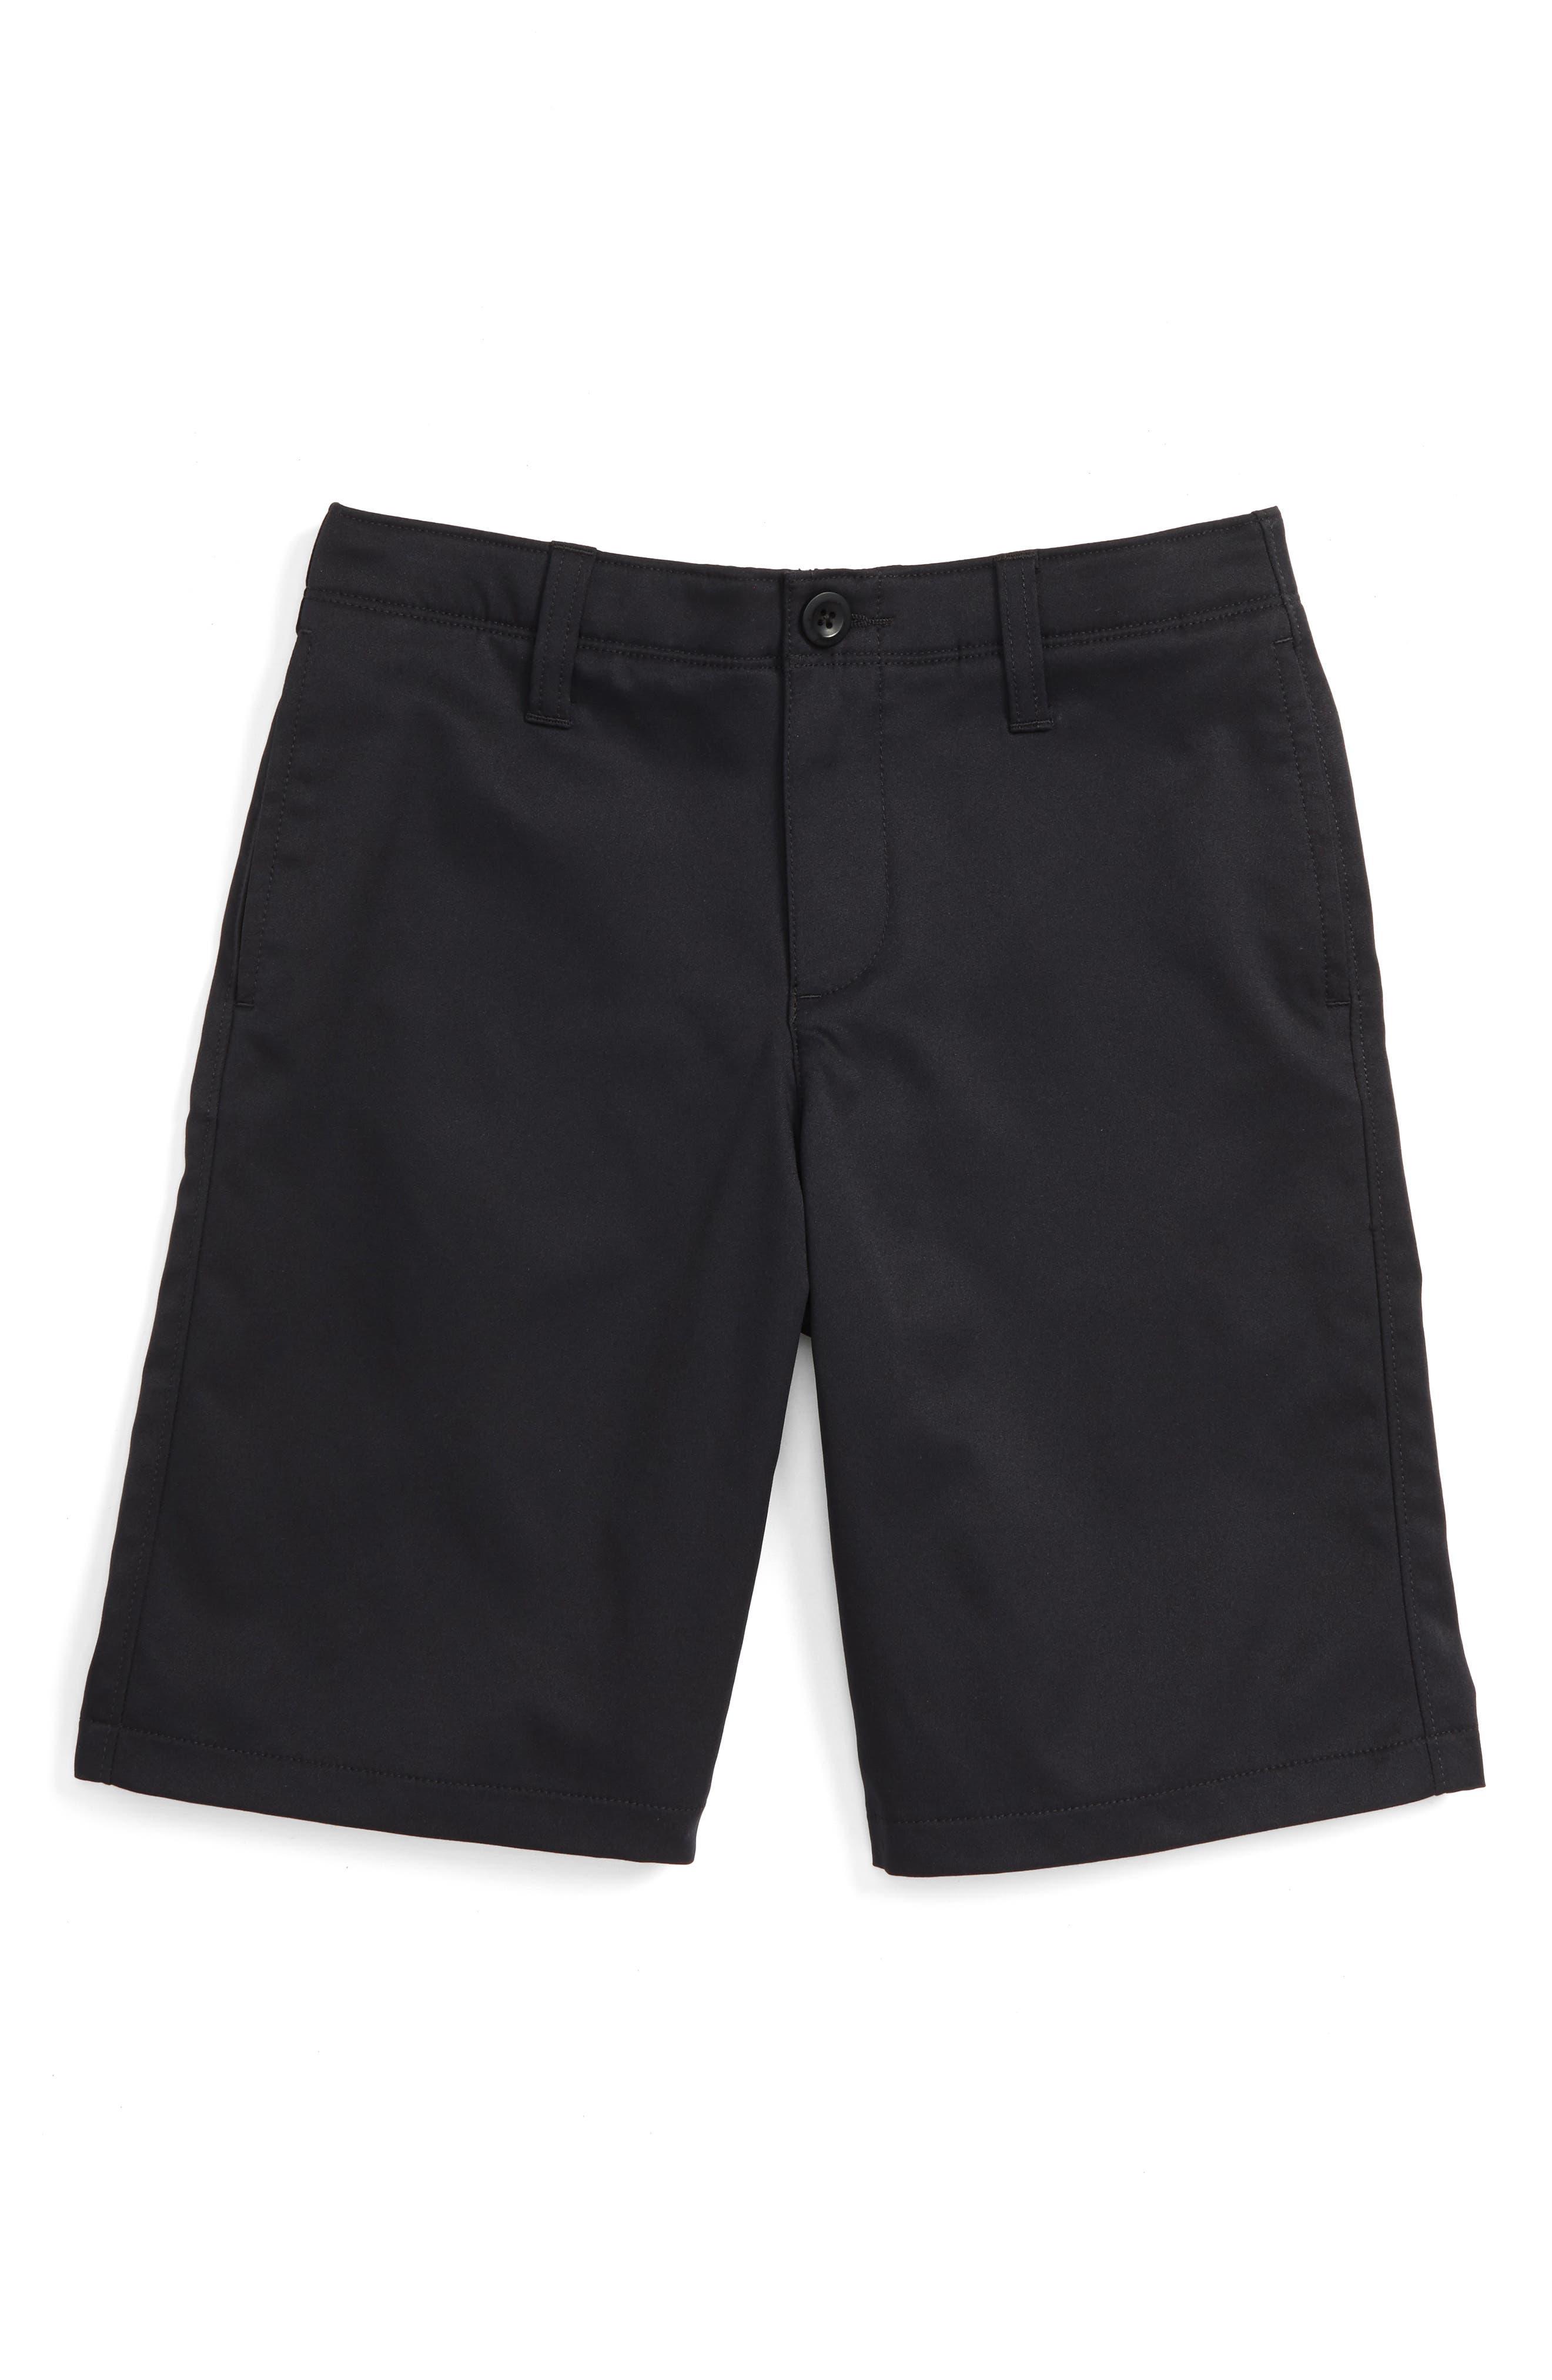 UNDER ARMOUR, Match Play Shorts, Main thumbnail 1, color, BLACK